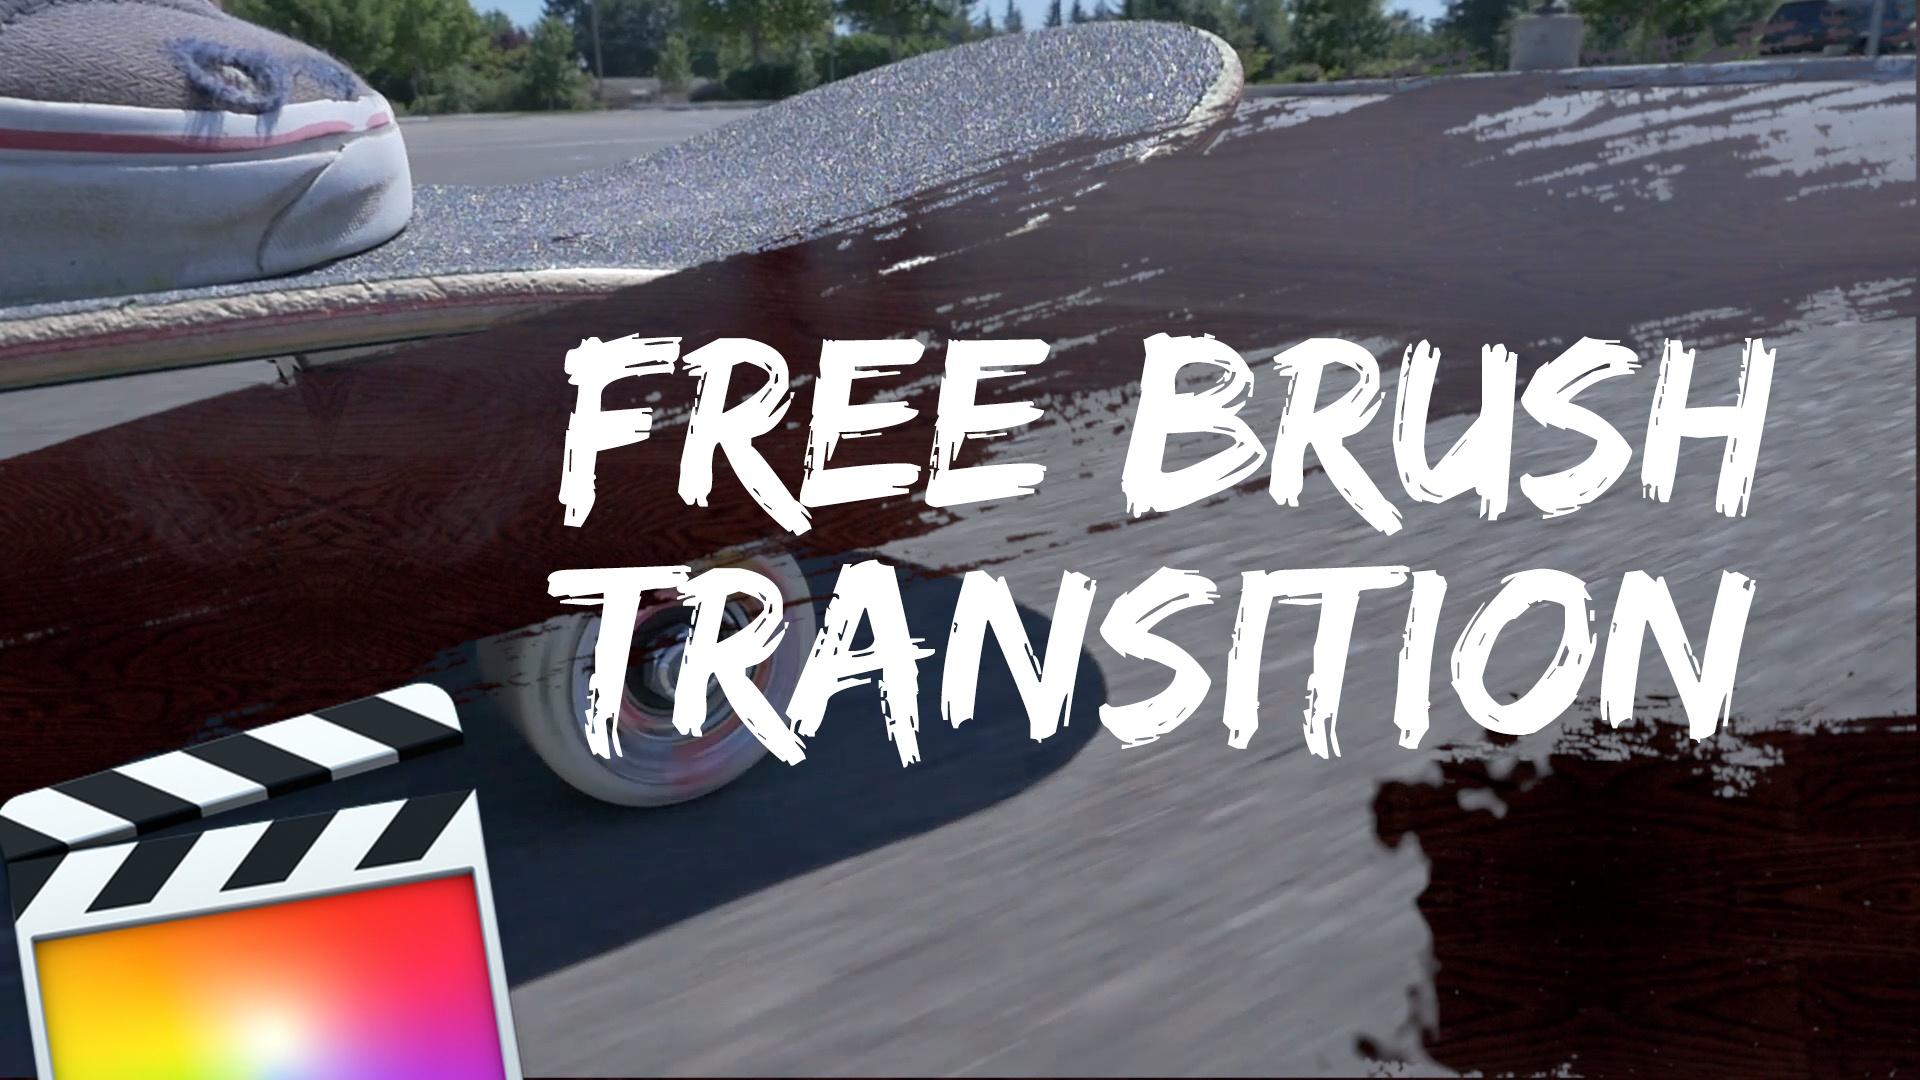 Free brush transition